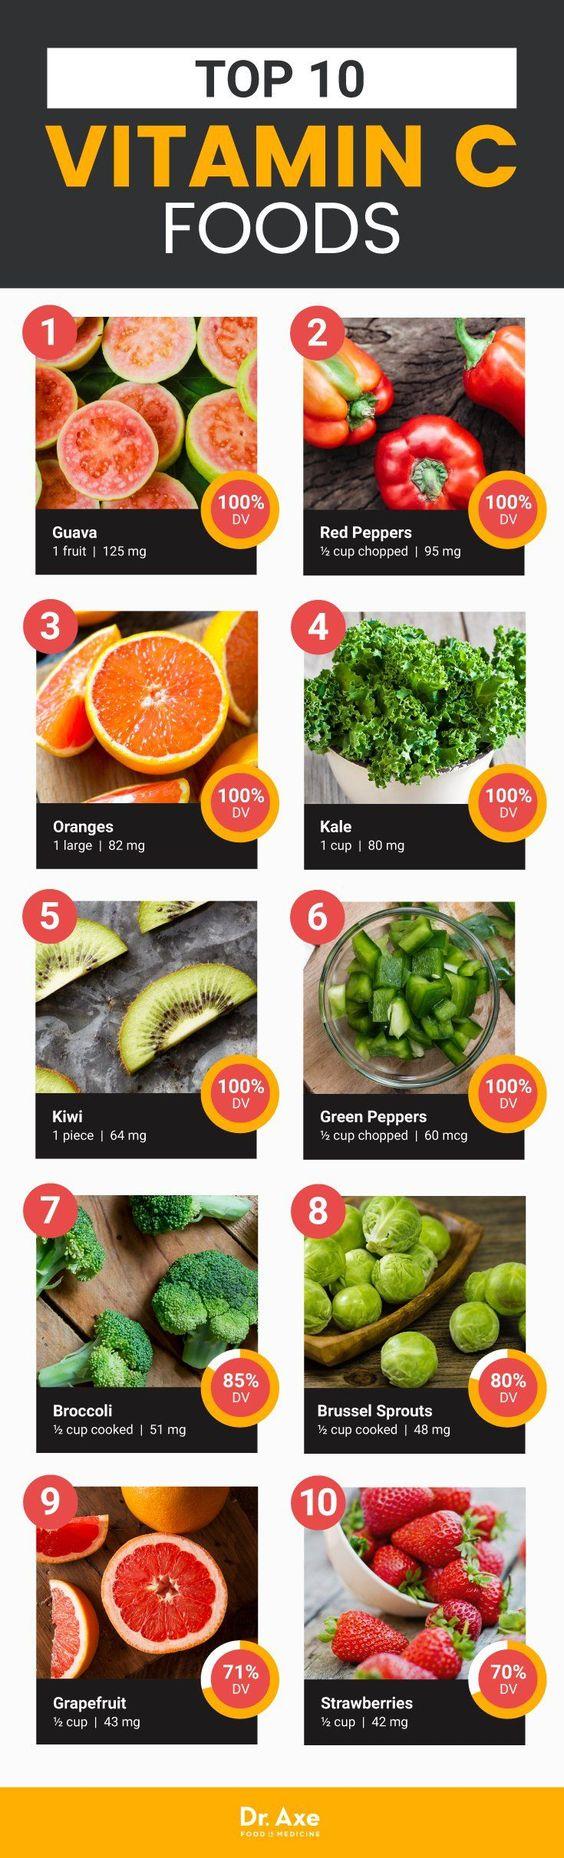 Vitamin C foods - Dr. Axe